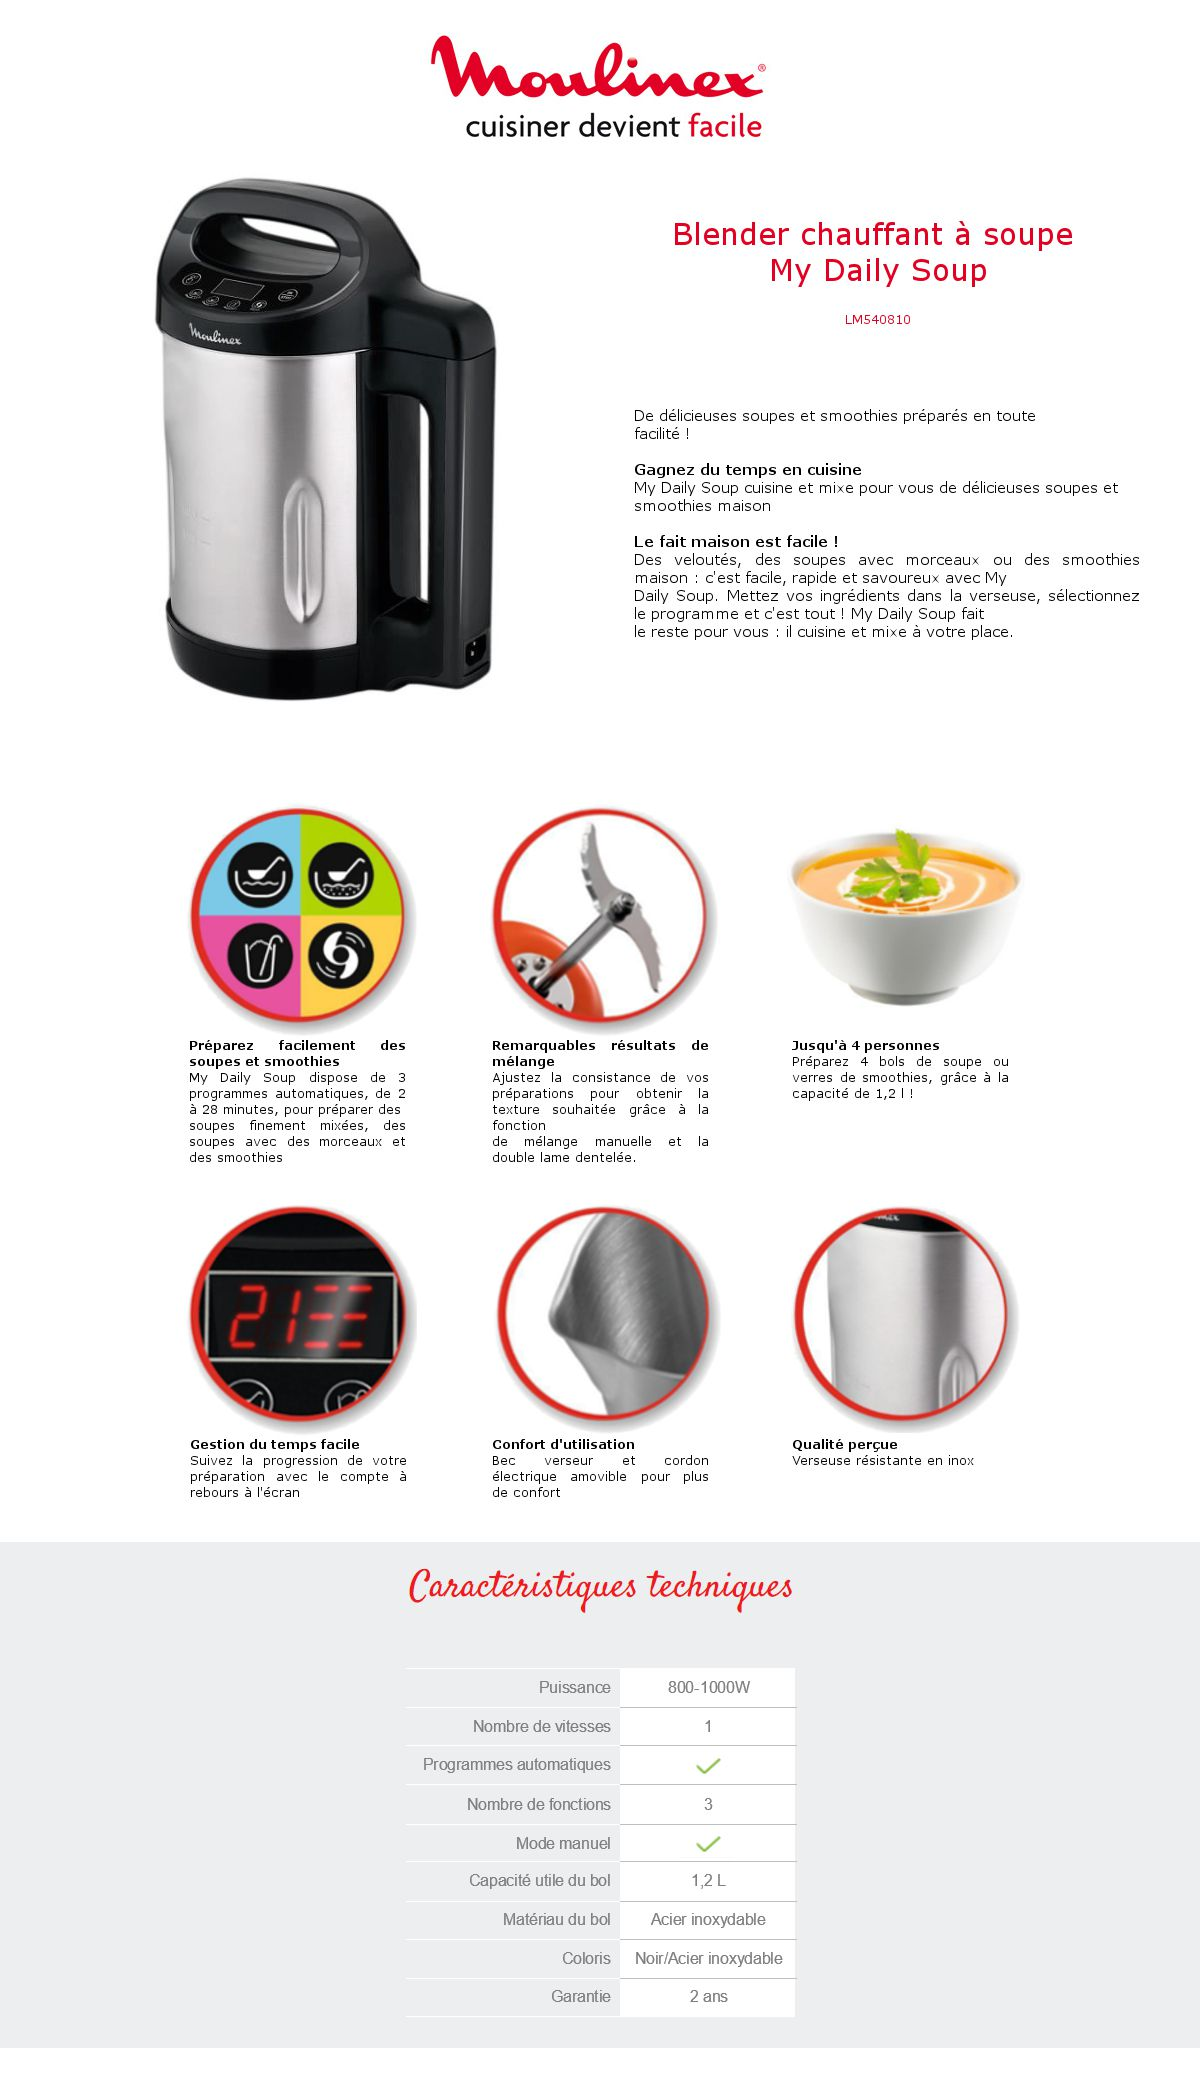 Moulinex blender chauffant 1 2l lm540810 my daily soup maker inox noir achat vente - Moulinex my daily soup ...